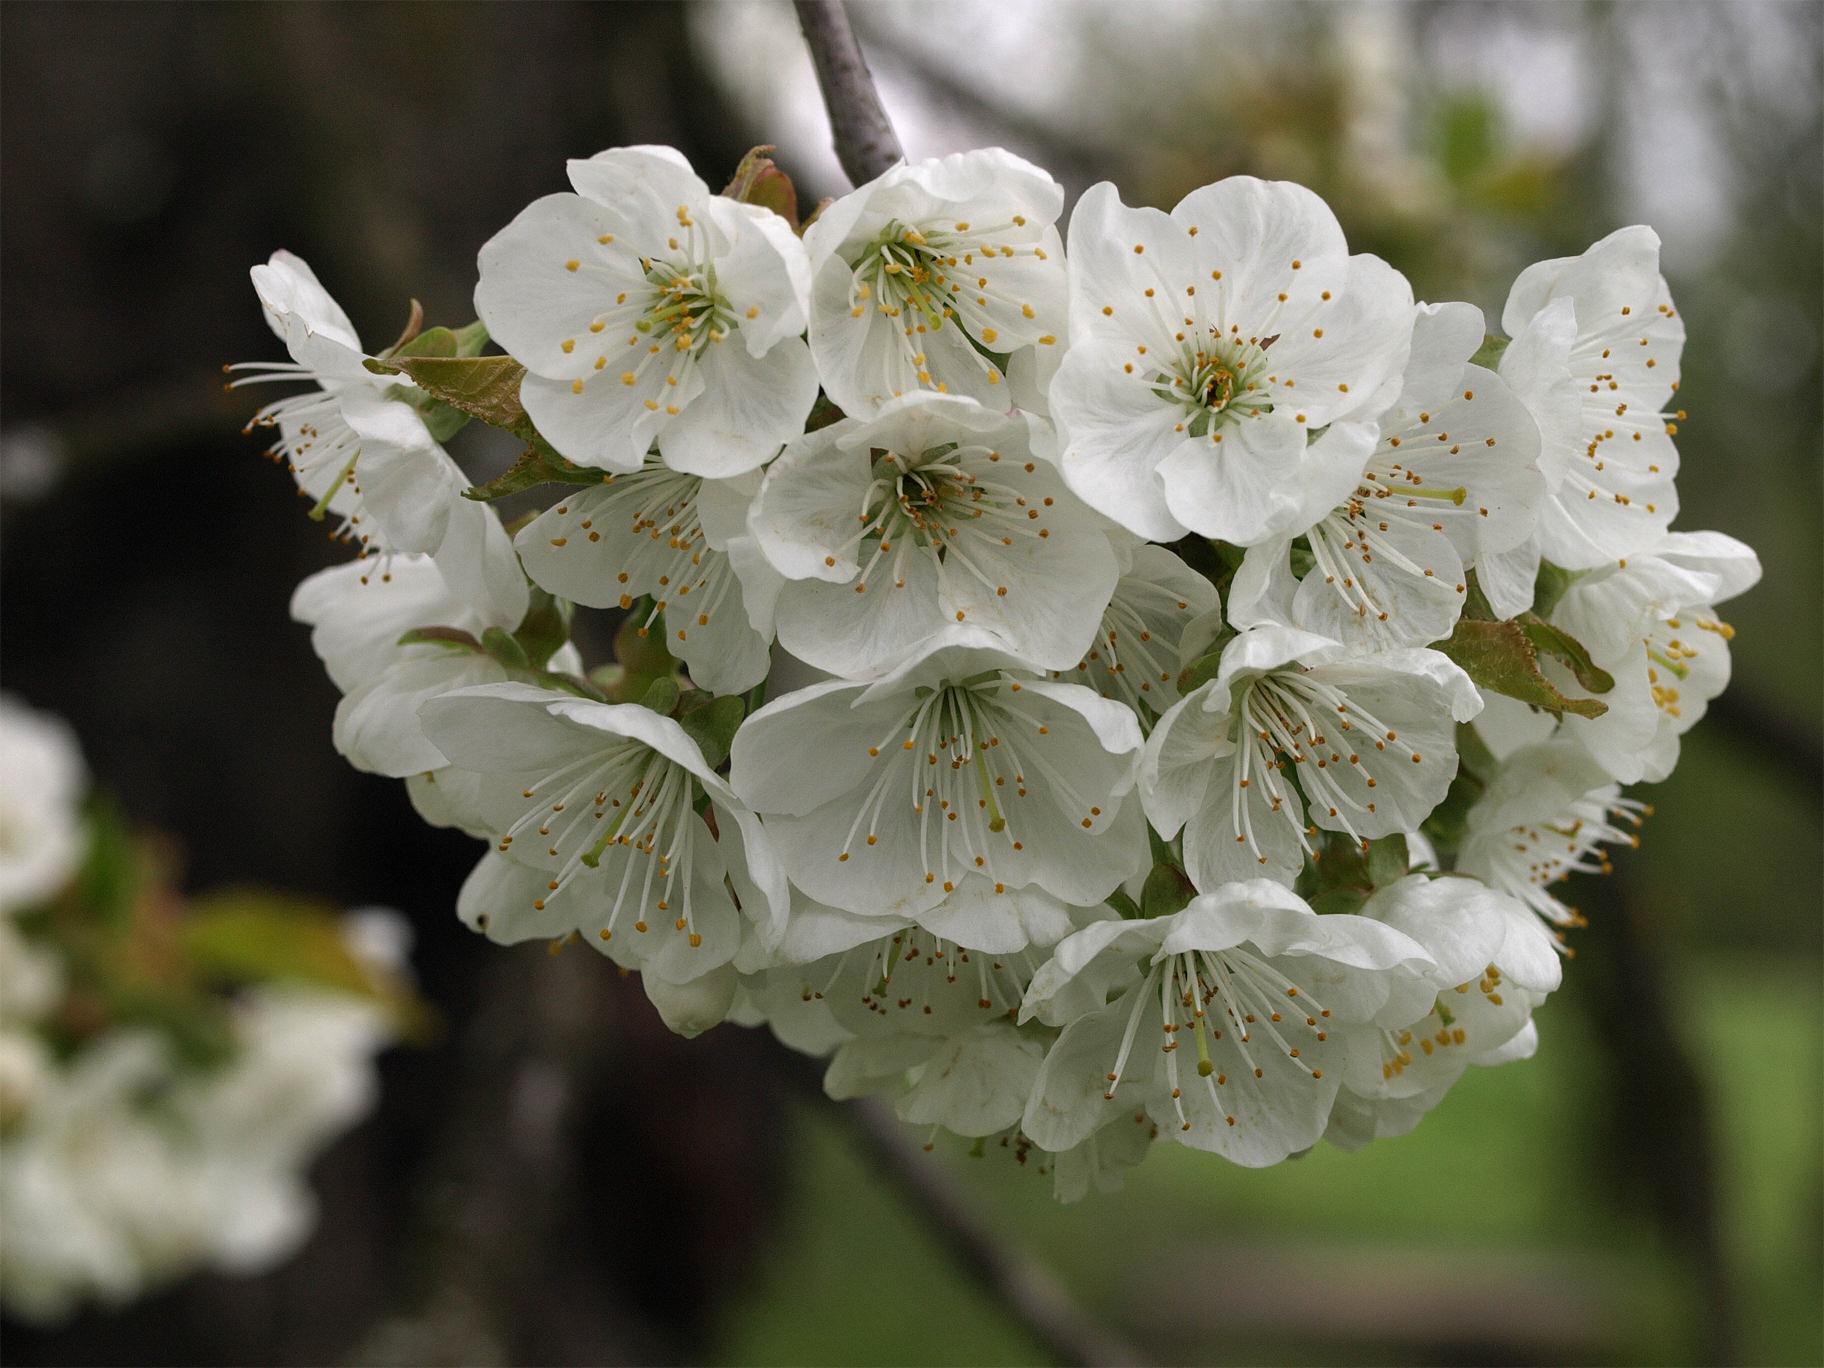 Close-up-flower-of-Wild-cherry